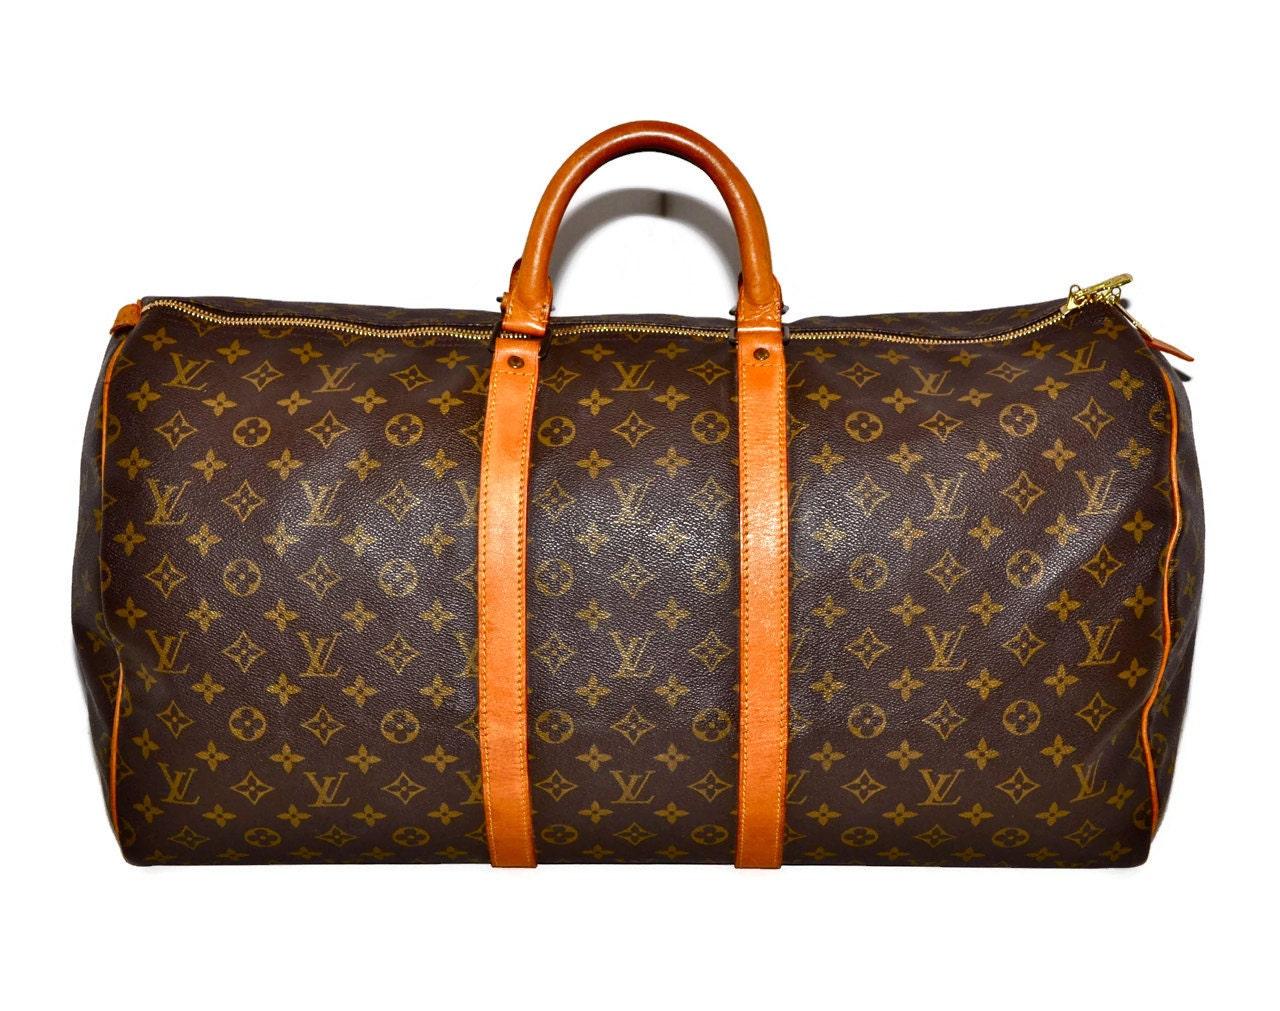 Image Result For Lv Duffle Bag For Men